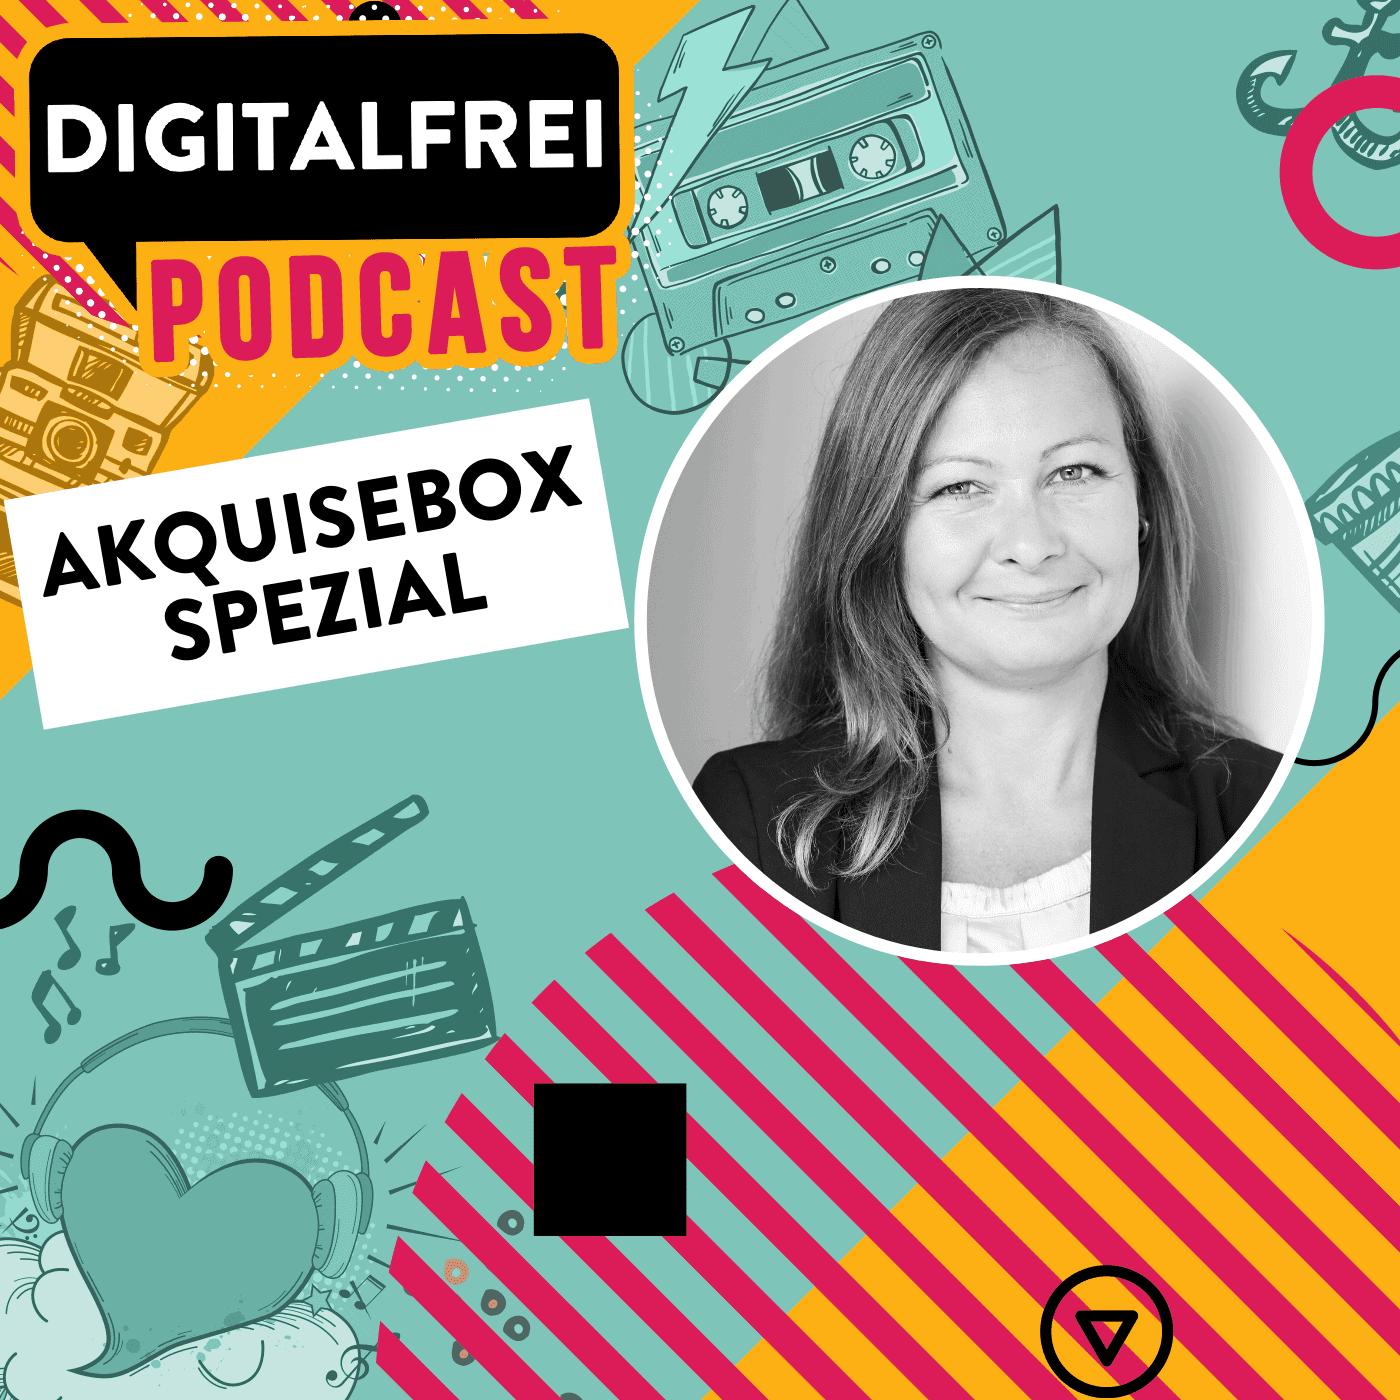 Akquisebox Spezial – Christina Karasek – Kundengewinnung mit LinkedIn